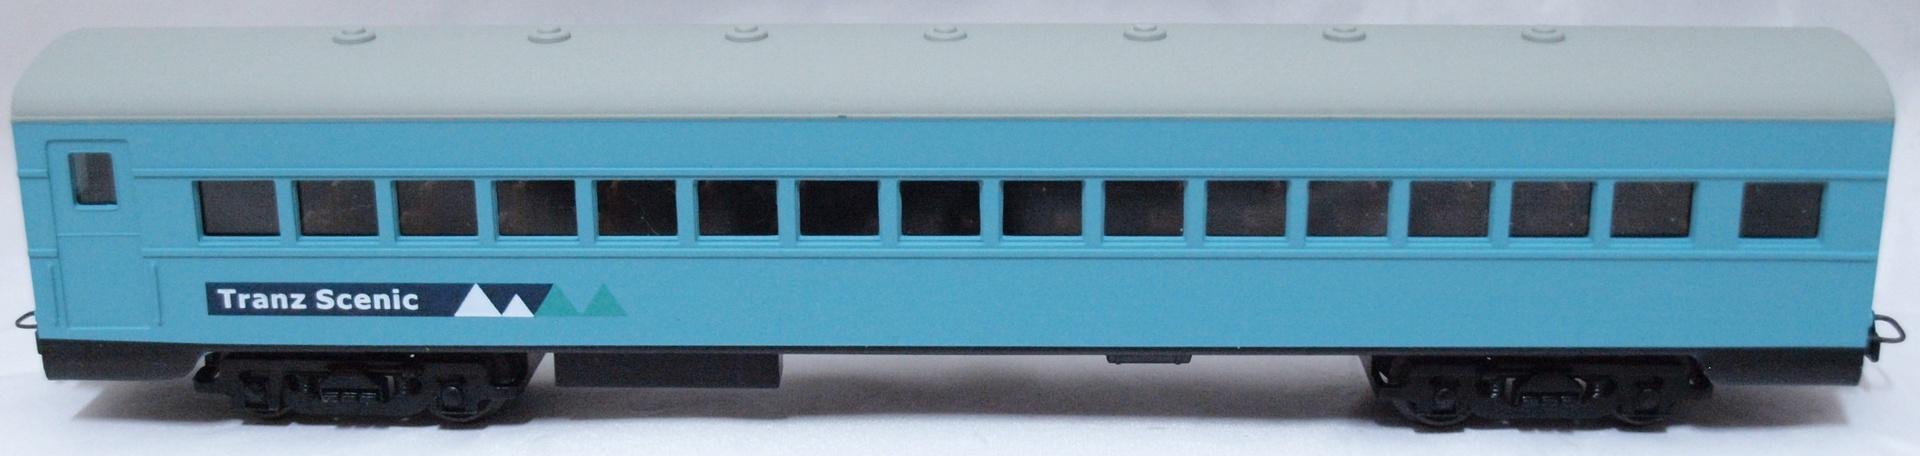 Frateschi #2595 HO Carbon Steel Passenger Car (Tranz Scenic Logo)